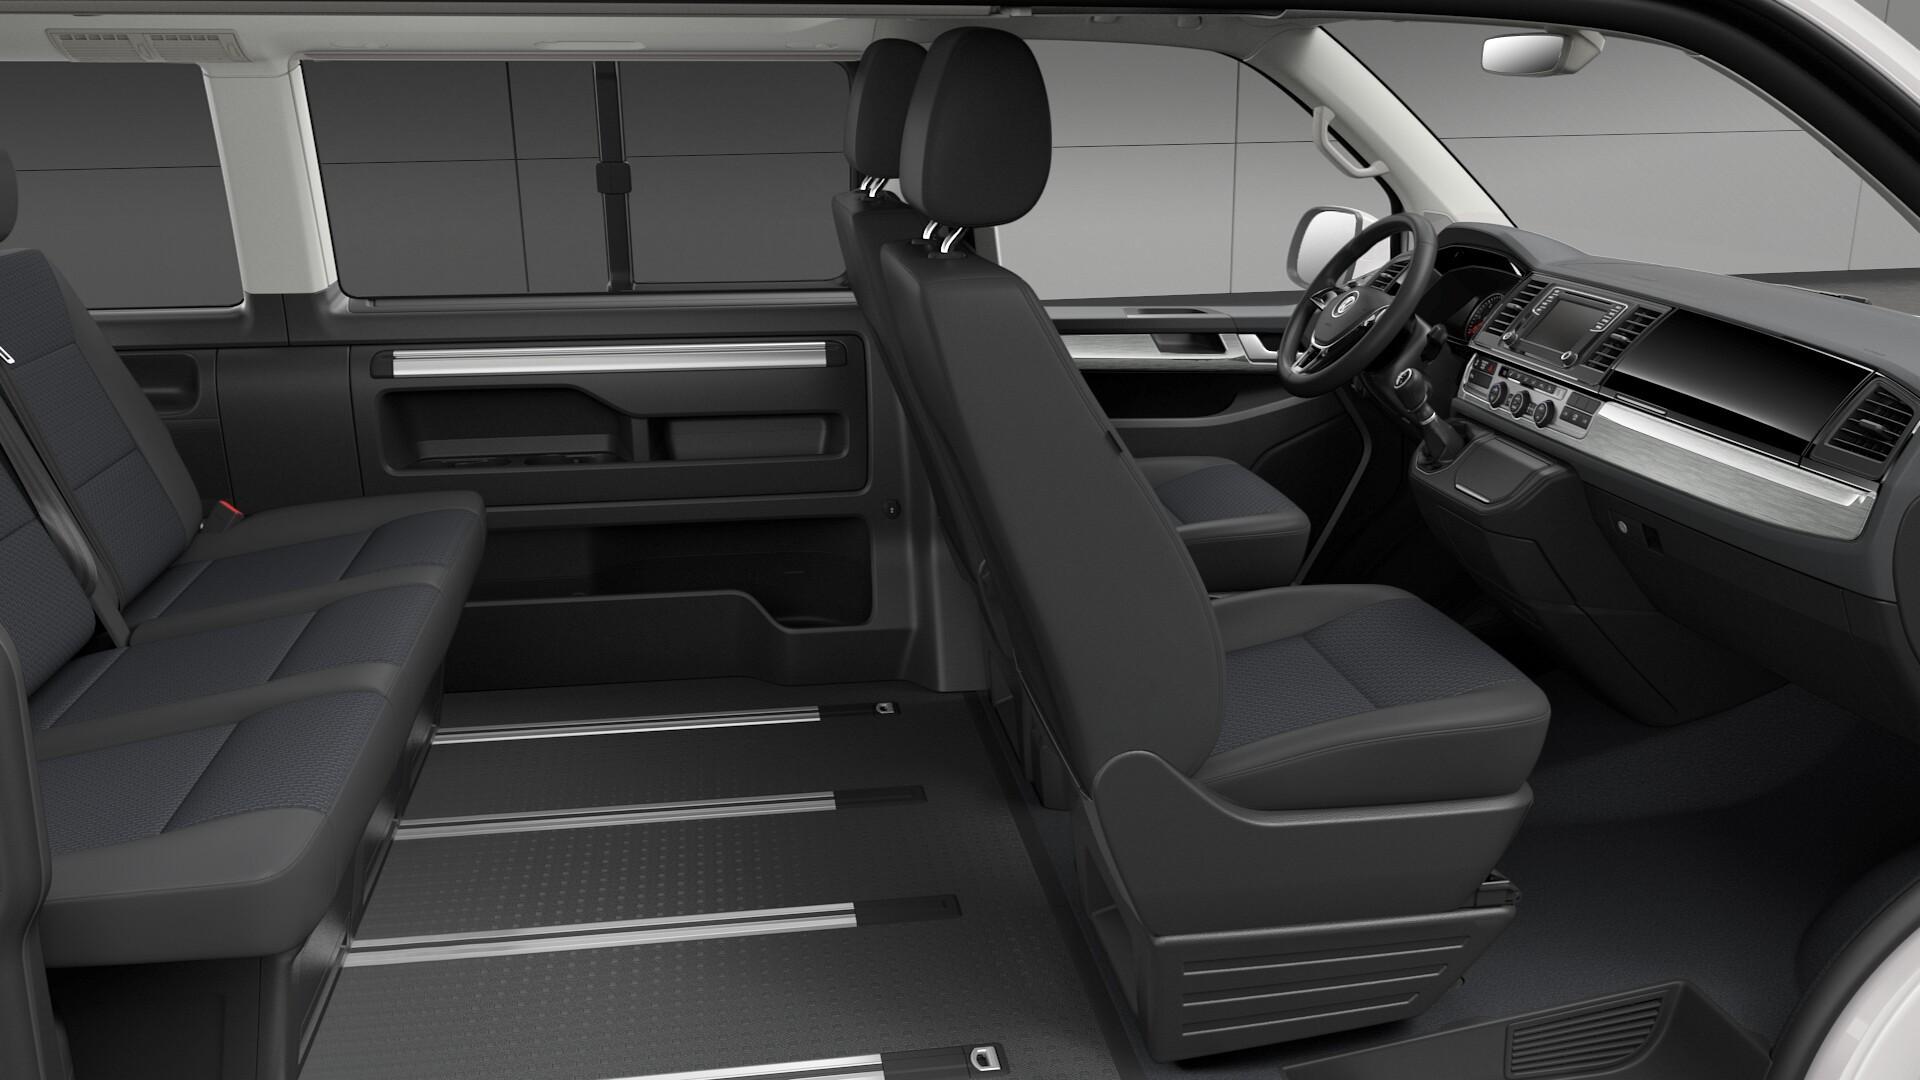 Volkswagen California Beach Edition VW T6 2,0 TDI 150HP 4motion ...